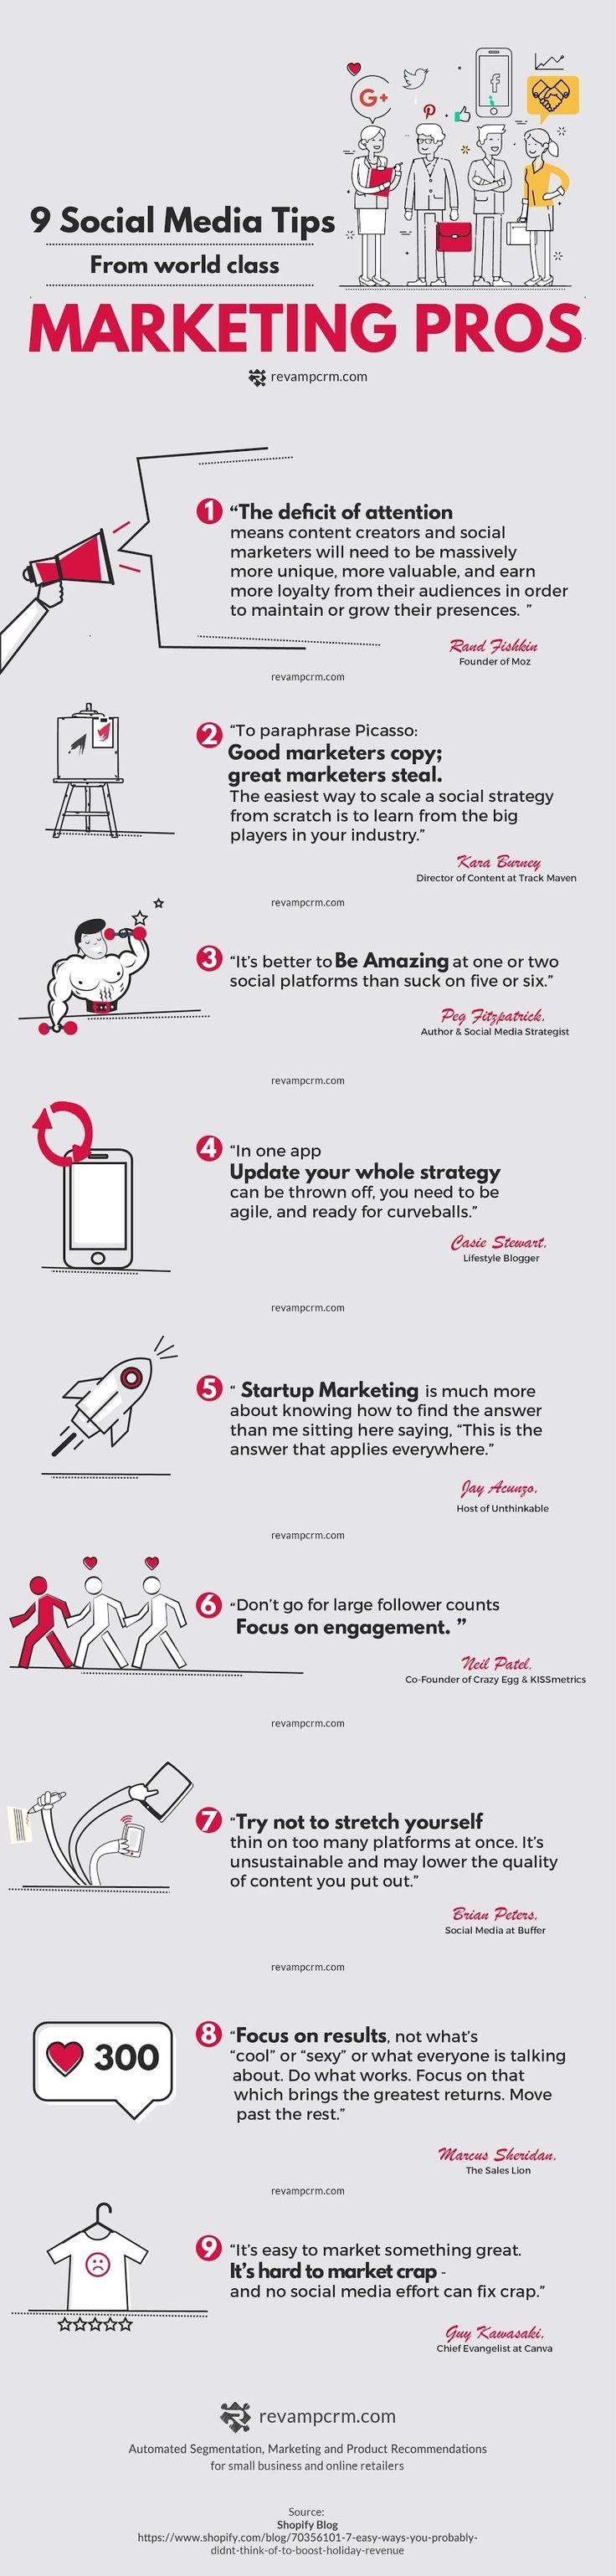 9 Social Media Tips From World Class Marketing Pros like /randfish/, /casiestewart/, @GuyKawasaki